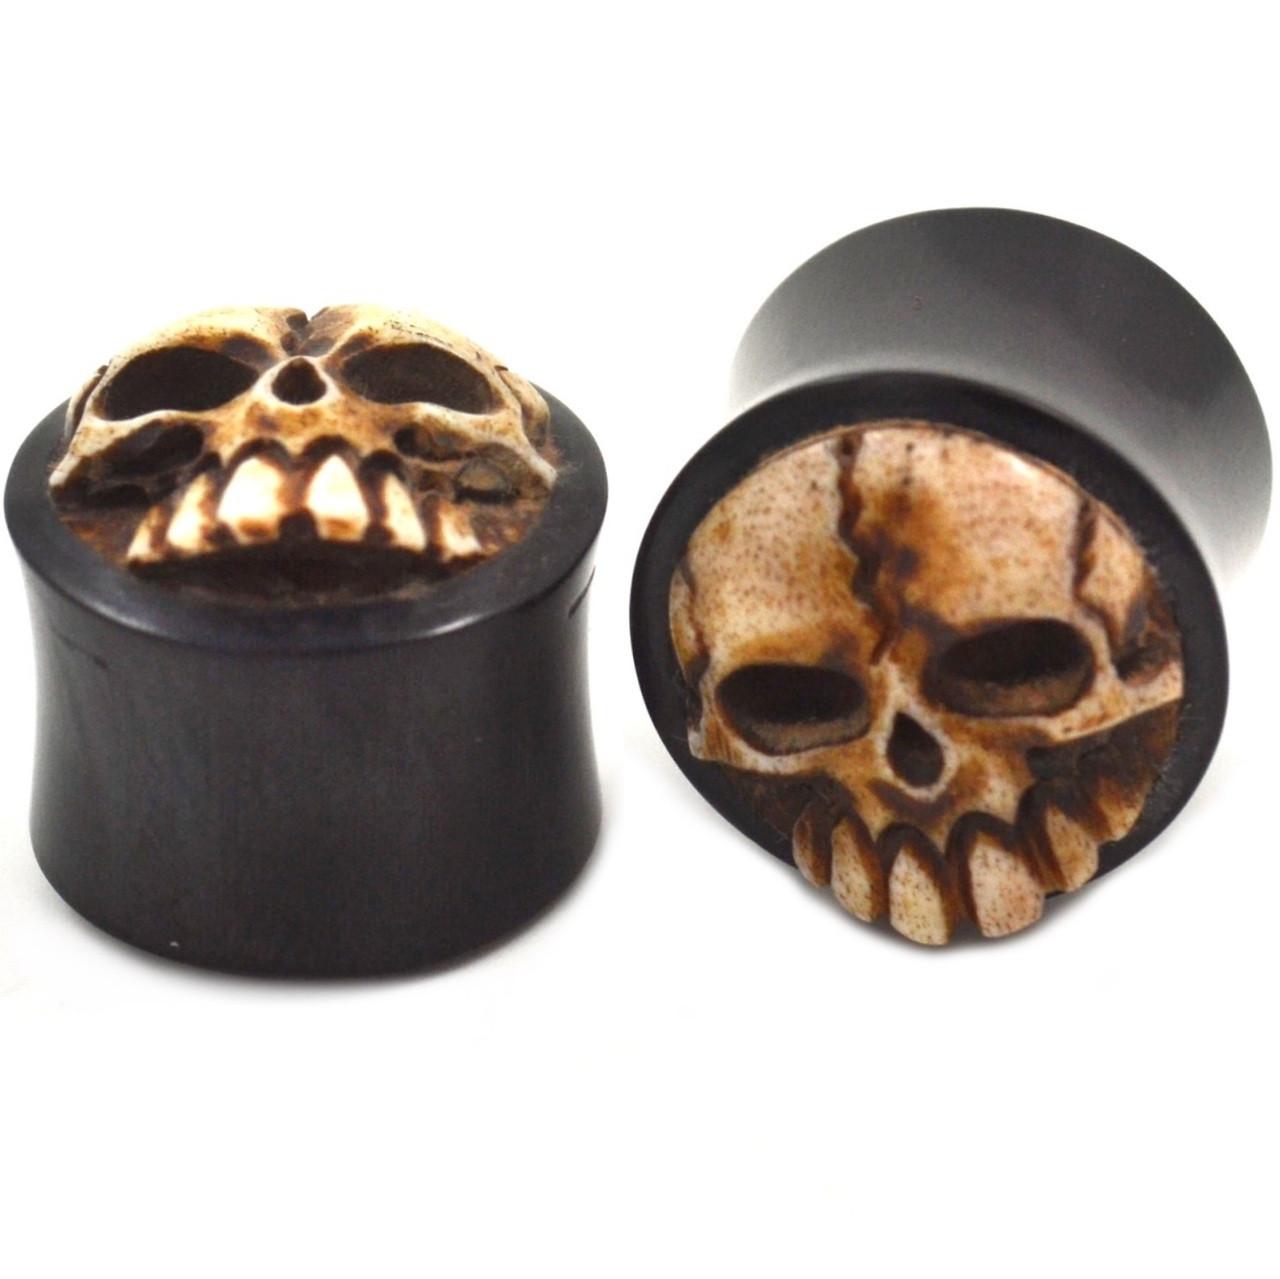 Carved 3d Skull Natural Black Horn Ear Plugs 00g 1 Bodydazz